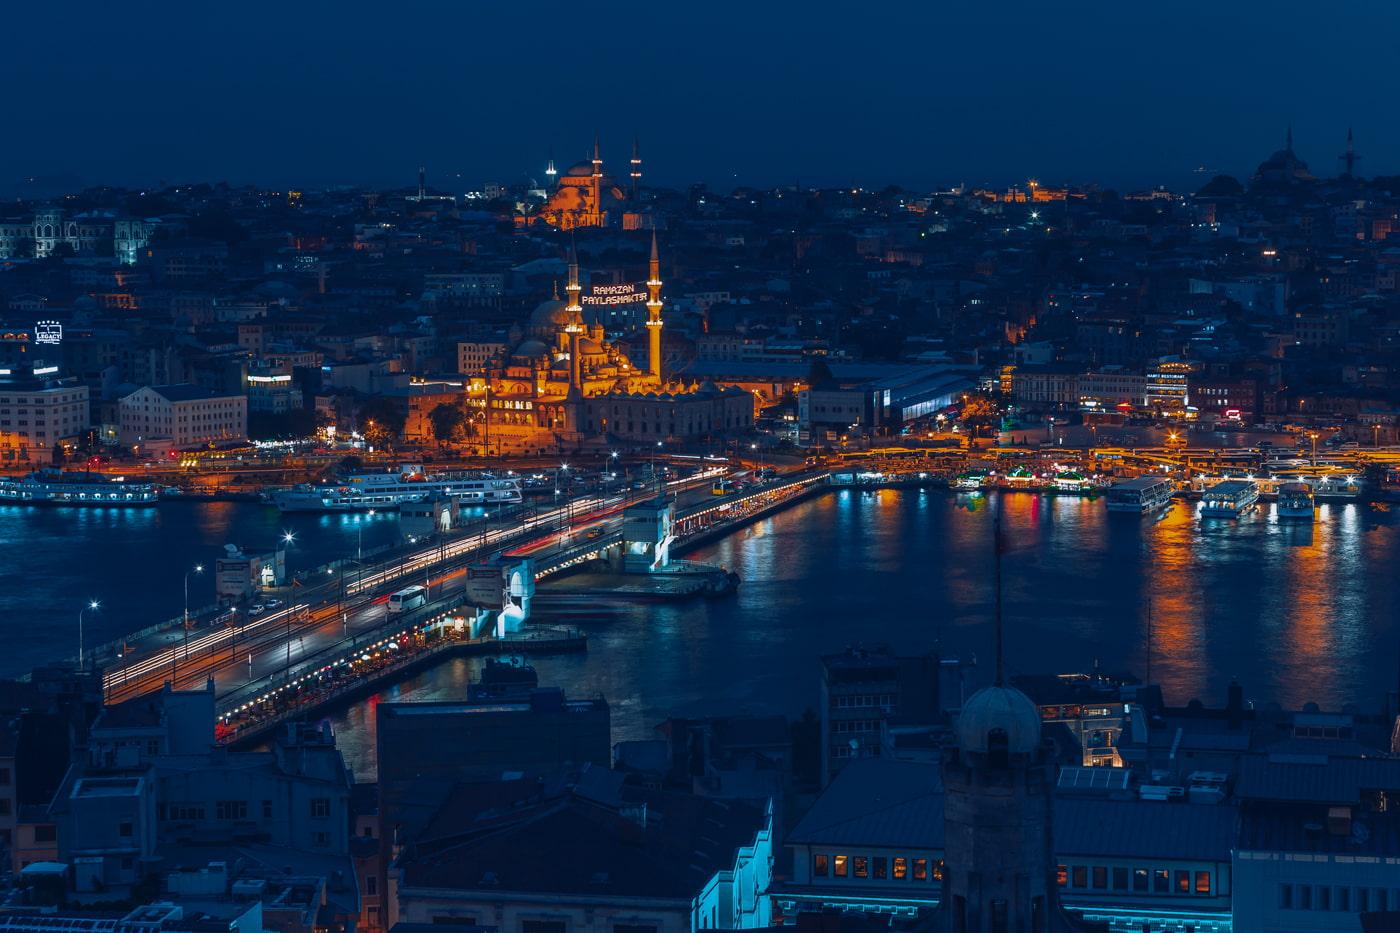 Galata Bridge at night